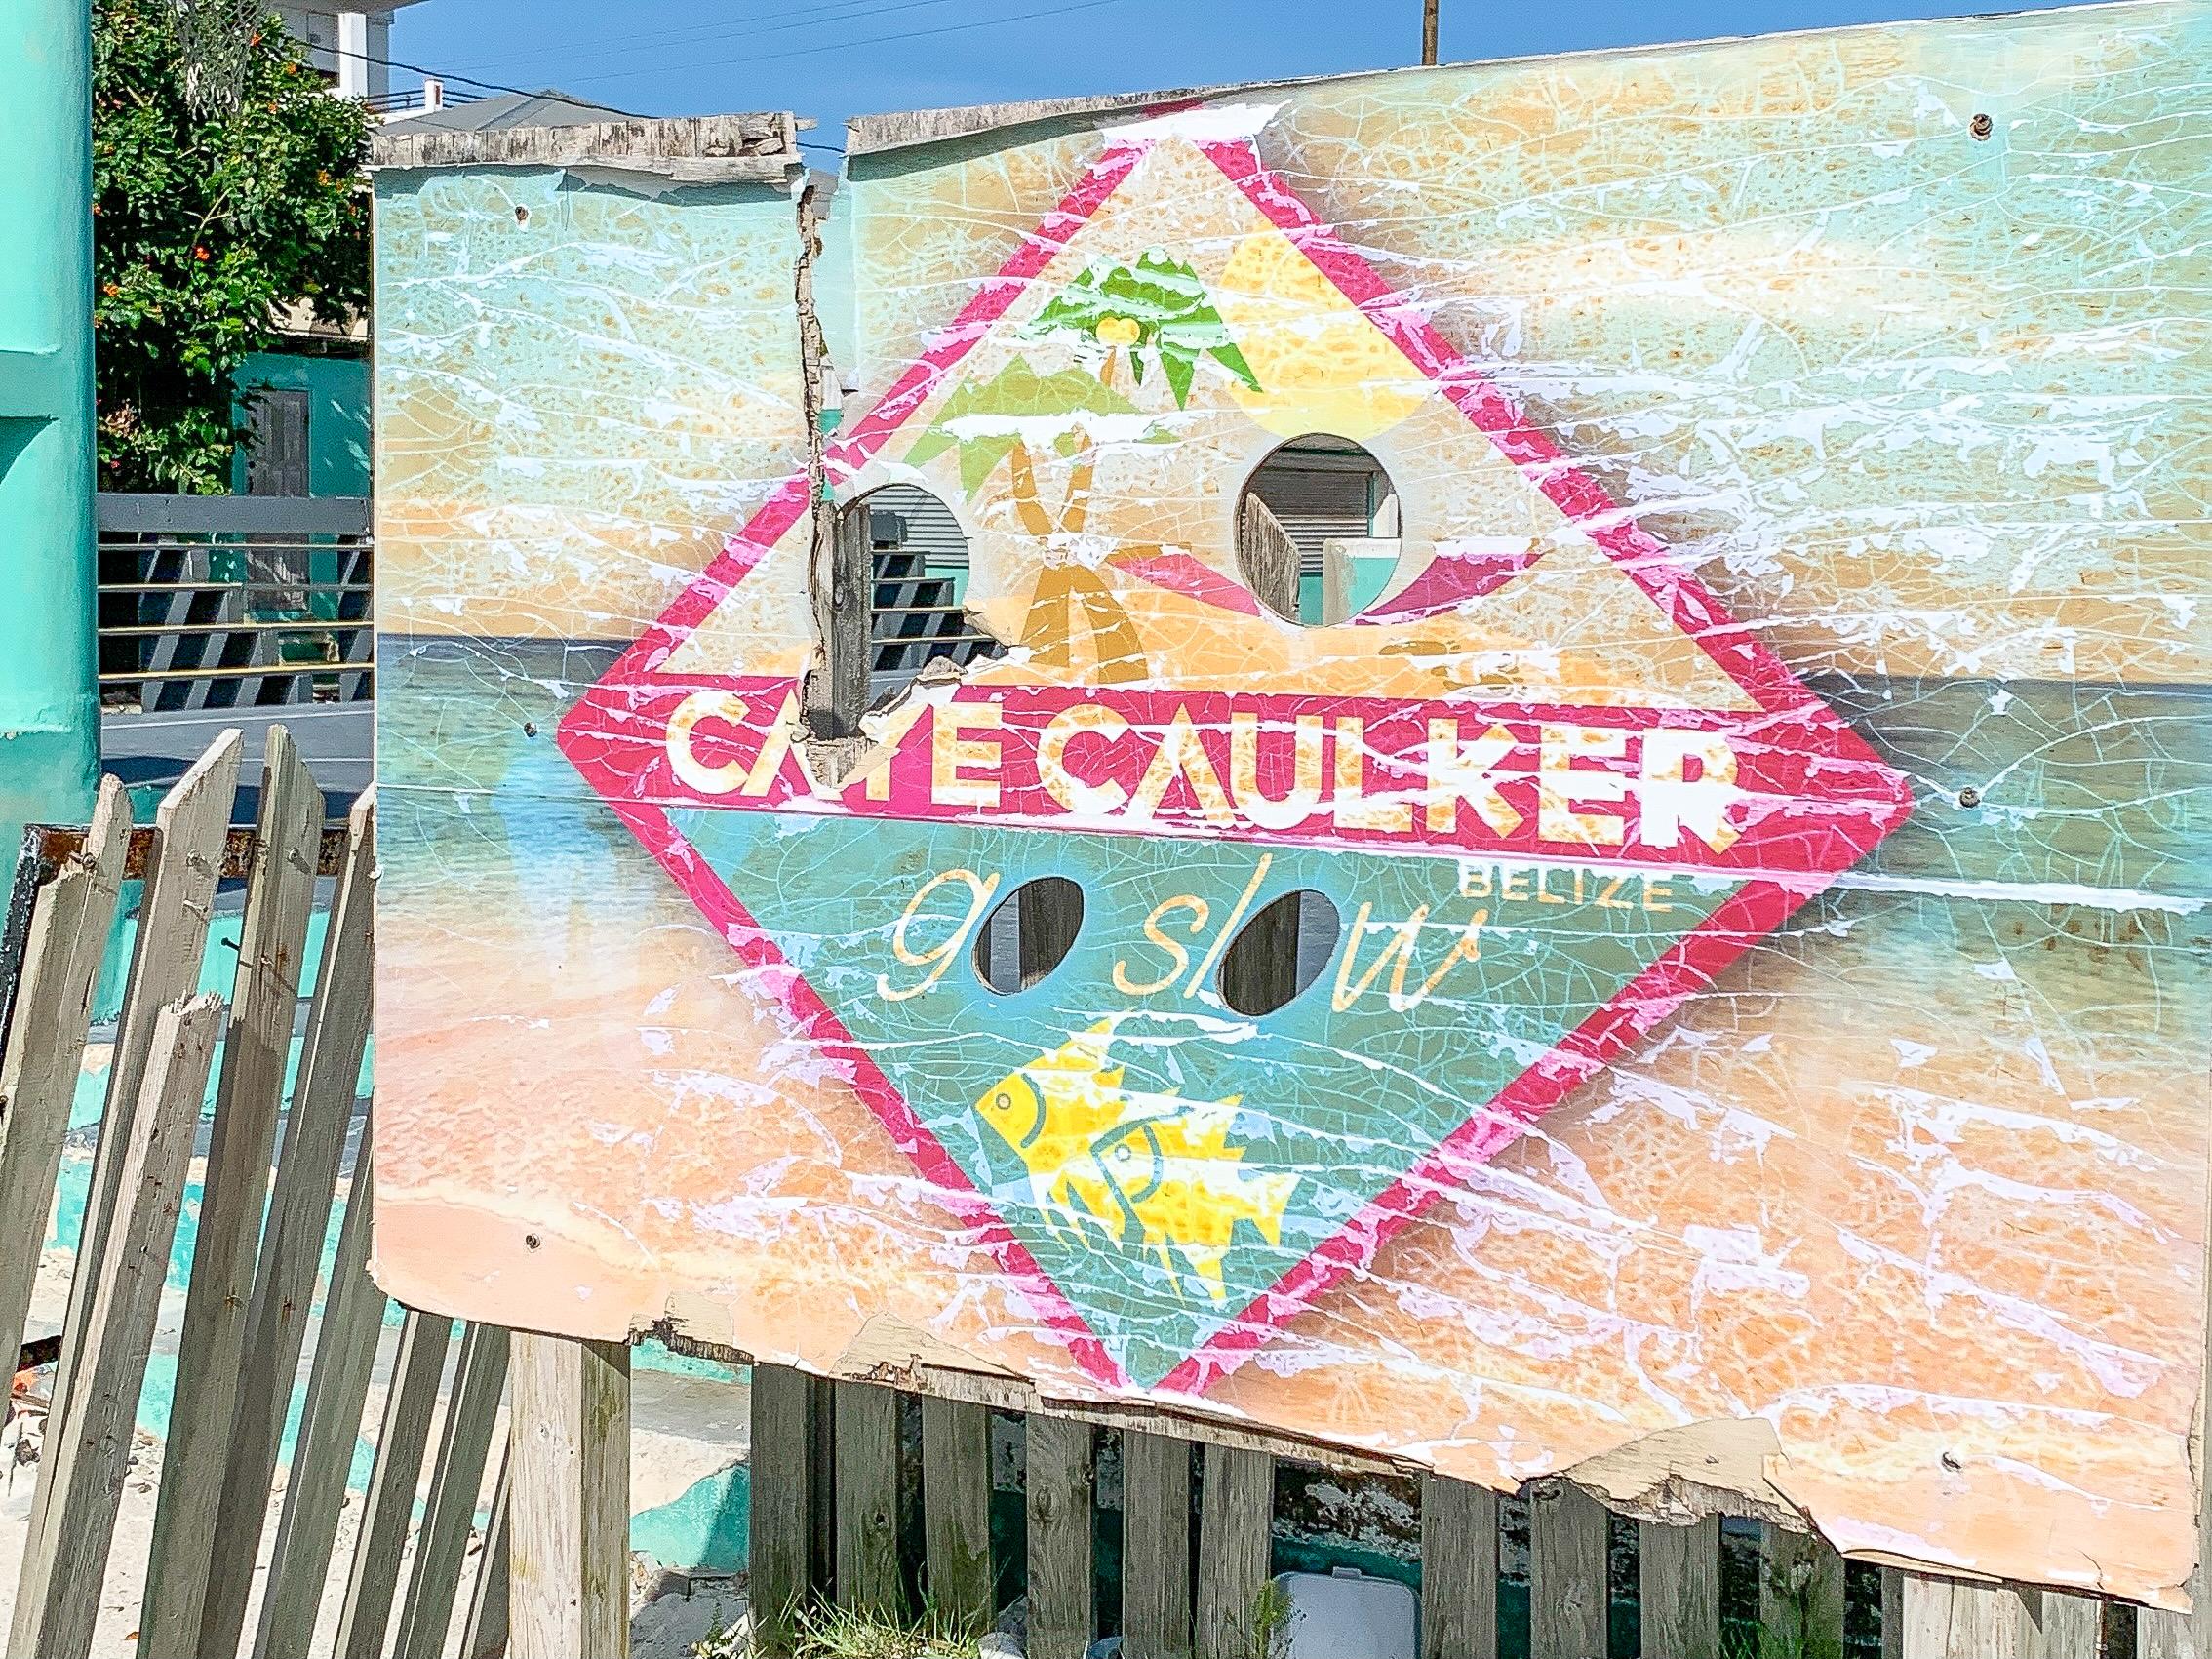 Caye Caulker